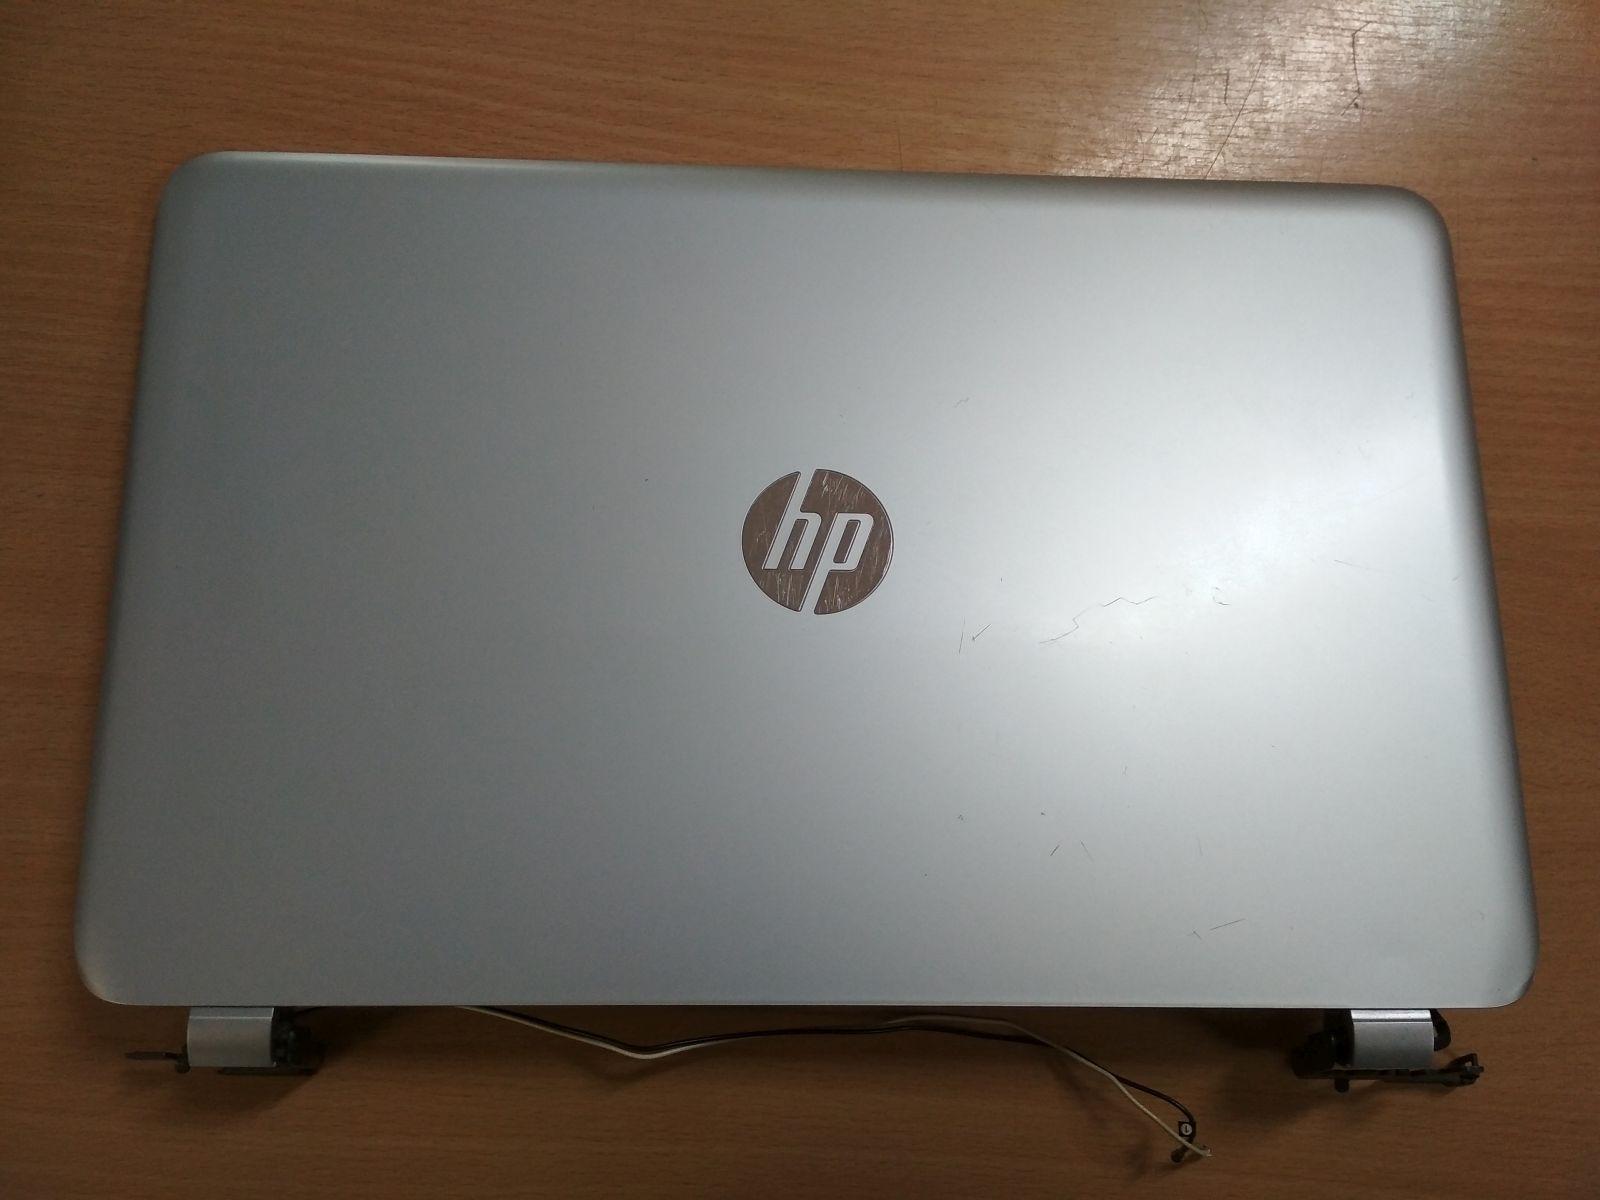 HP Pavilion 15-N komplett LCD fedlap ZYU39U65TPF EAU650030C0 használt 1 hó gar!